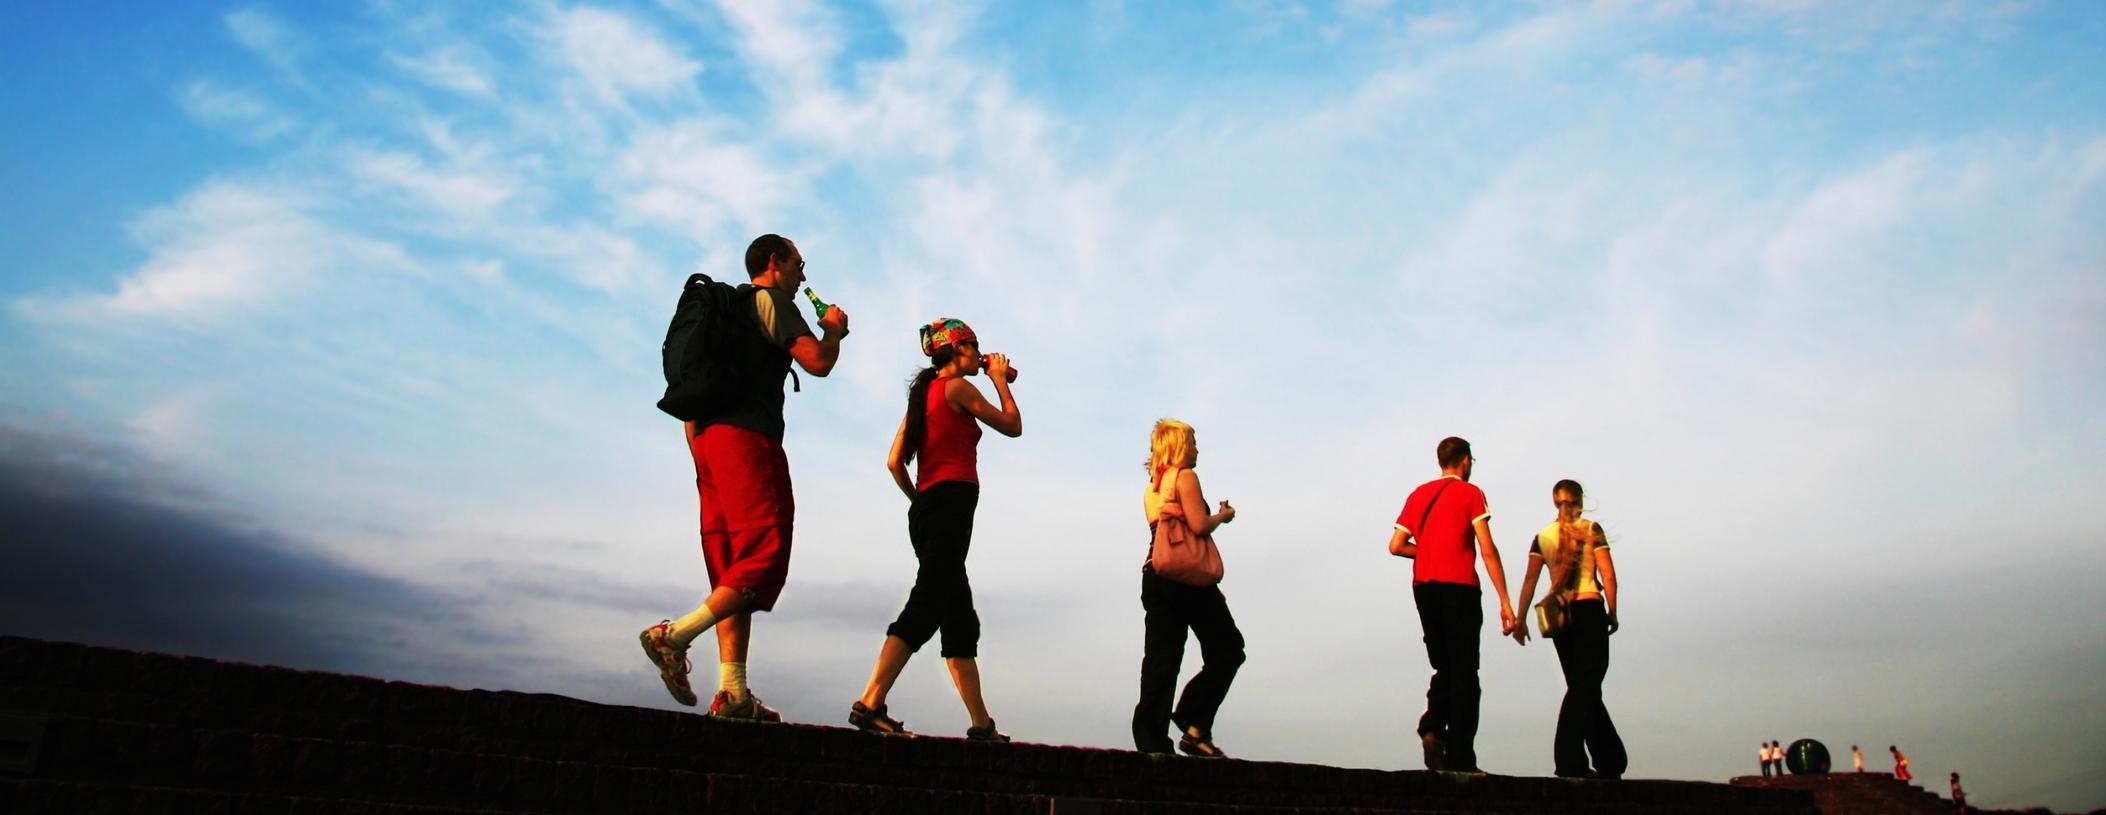 Walking Regularly Slashes Stroke Risk In Women By Nearly 50 Percent!